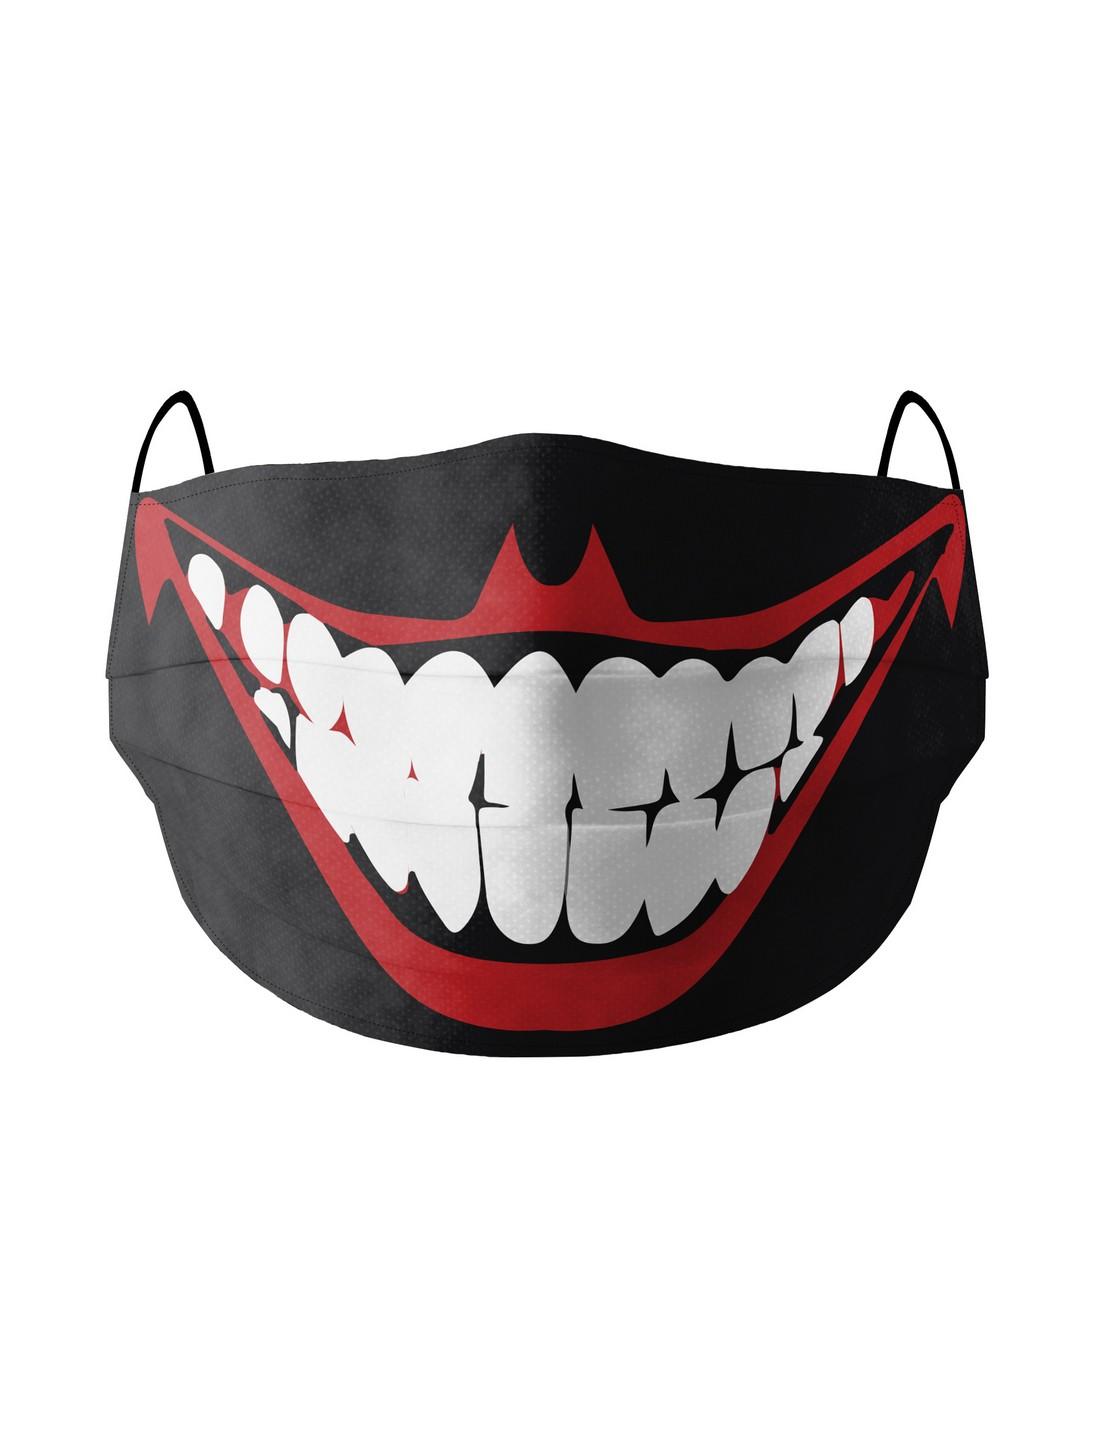 Soxytoes | Soxytoes Black Stylish Protective Washable Mouth Cover Face Mask